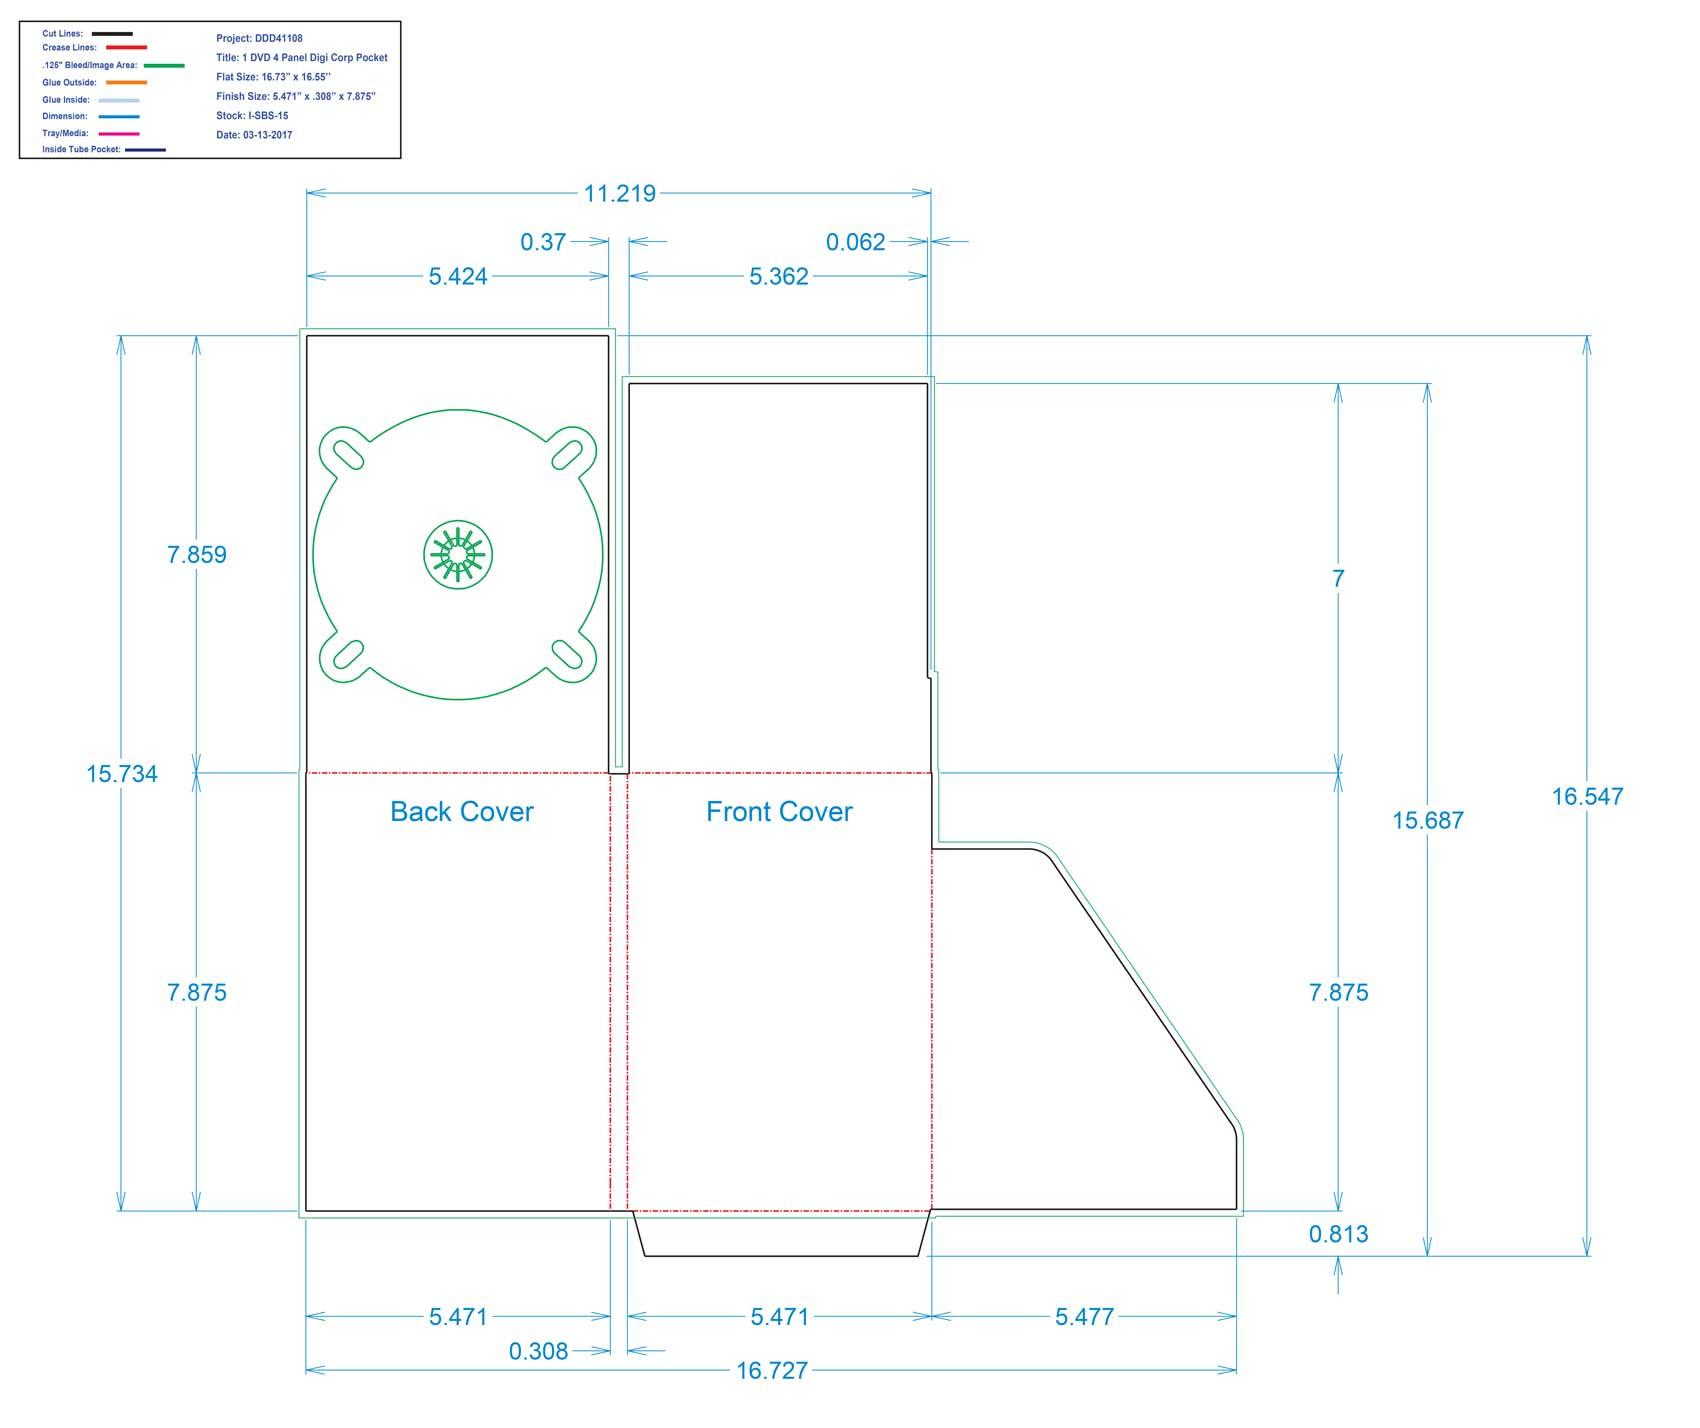 DDD41108- 1 DVD 4 Panel Digi Corp Pocket oversize